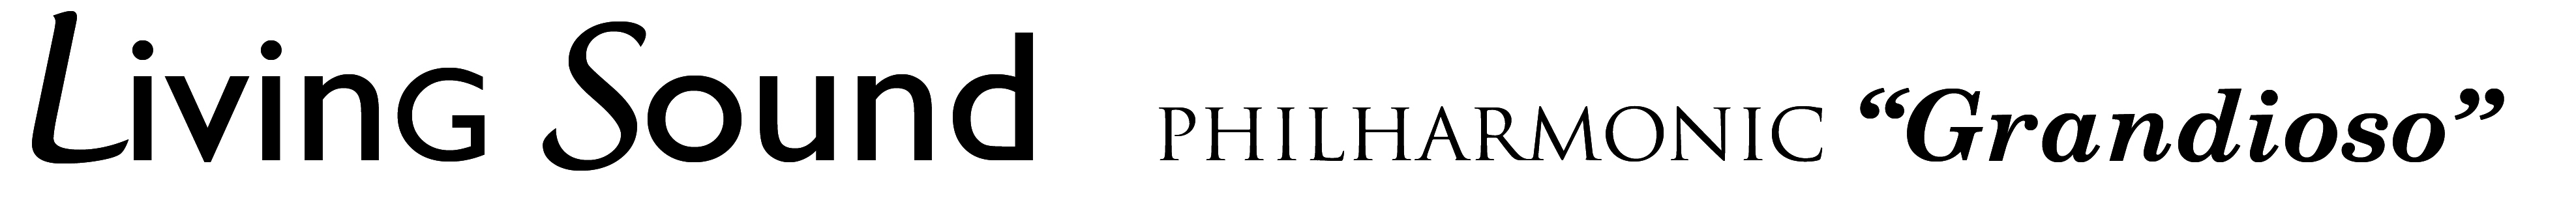 living-sound-philharmonic-grandioso.jpg